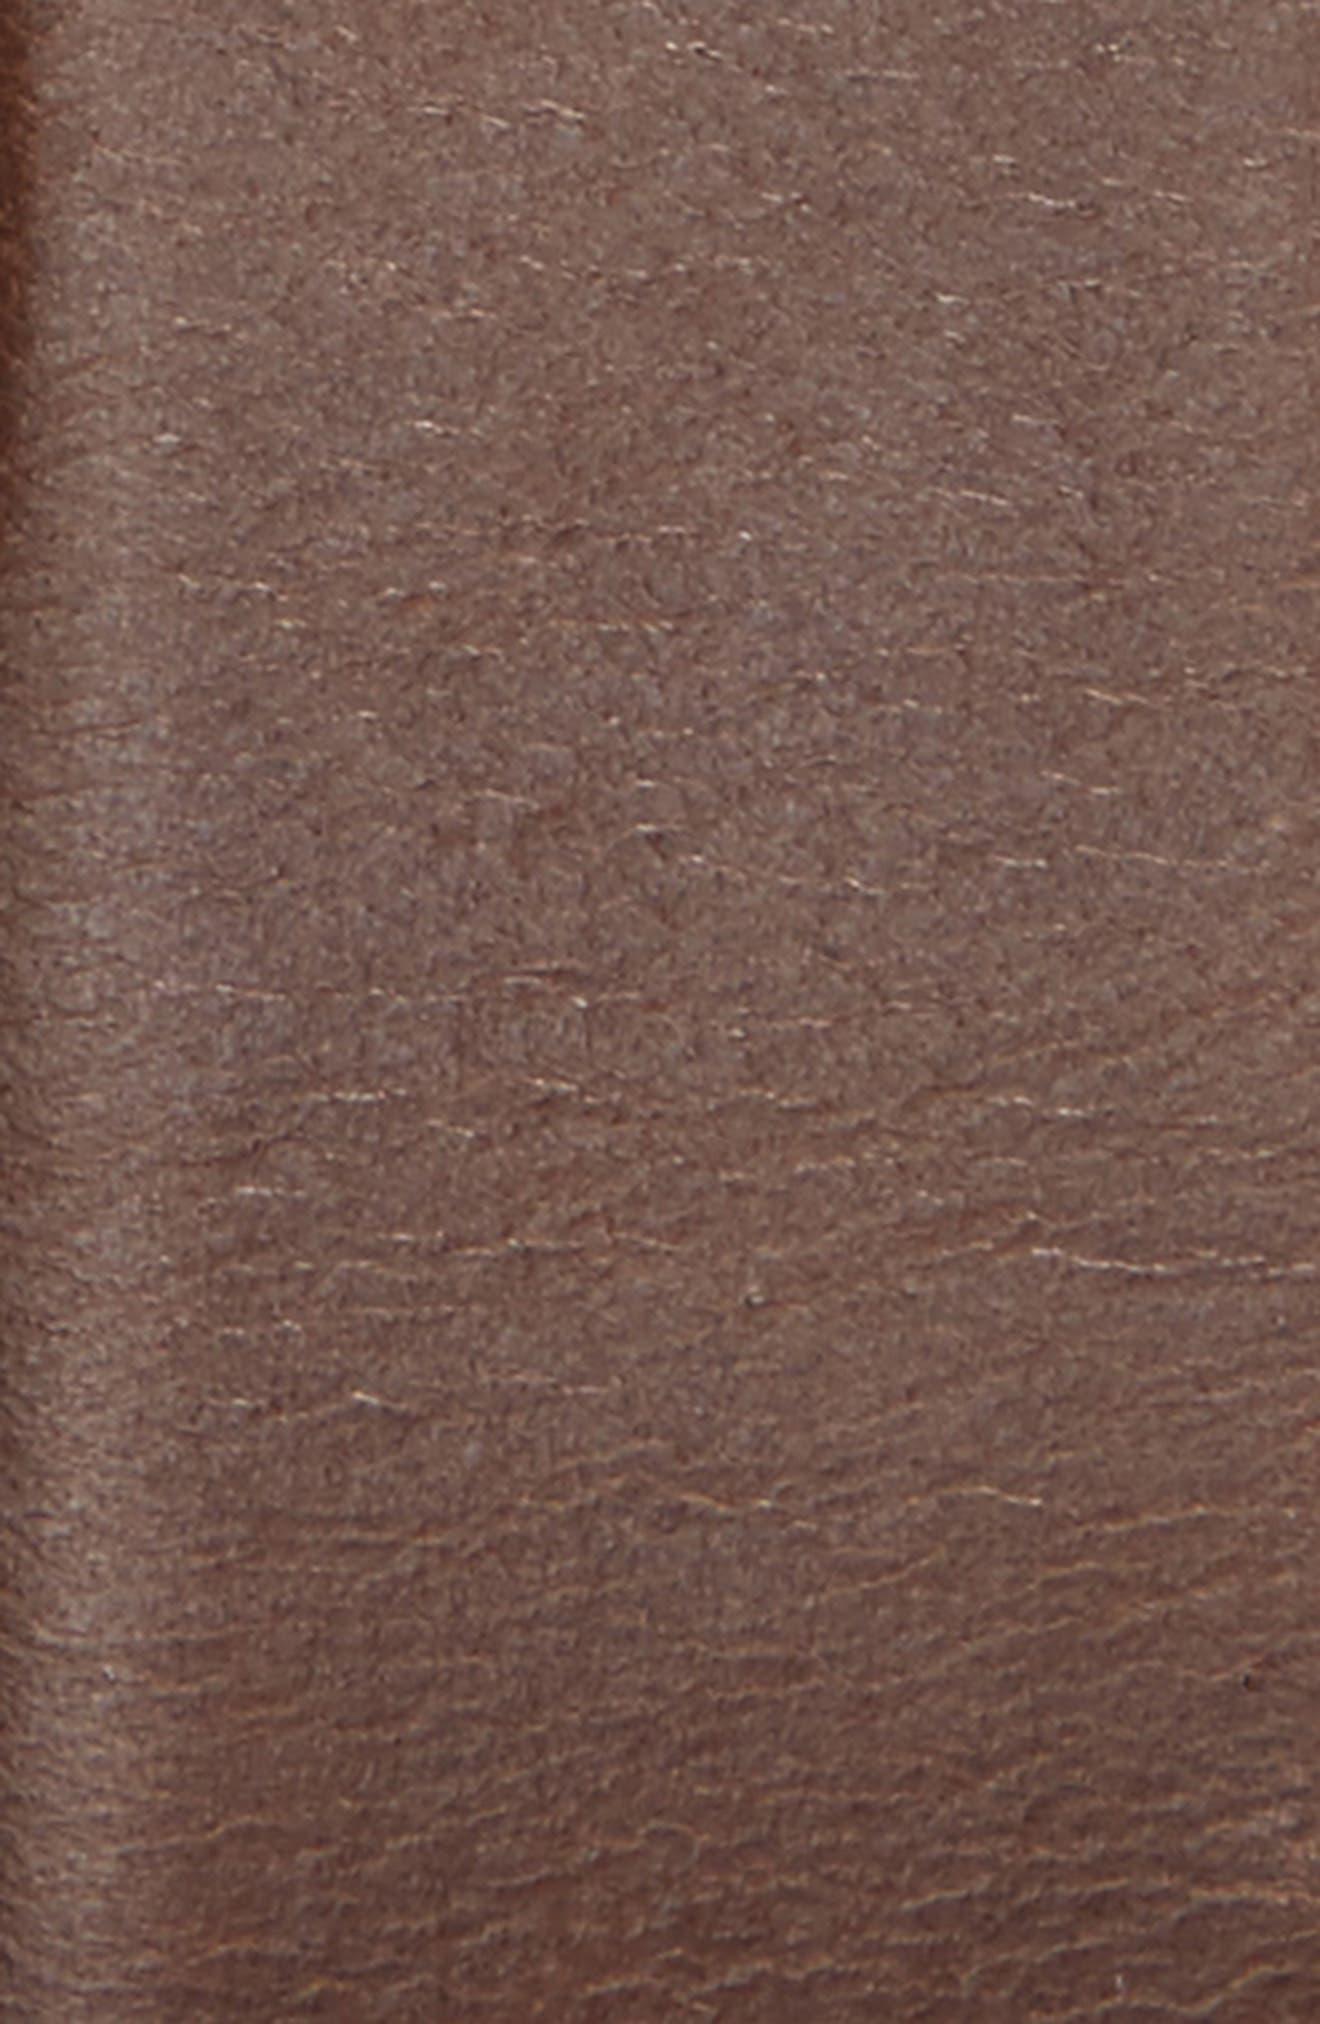 Celie Leather Belt,                             Alternate thumbnail 2, color,                             DARK BROWN